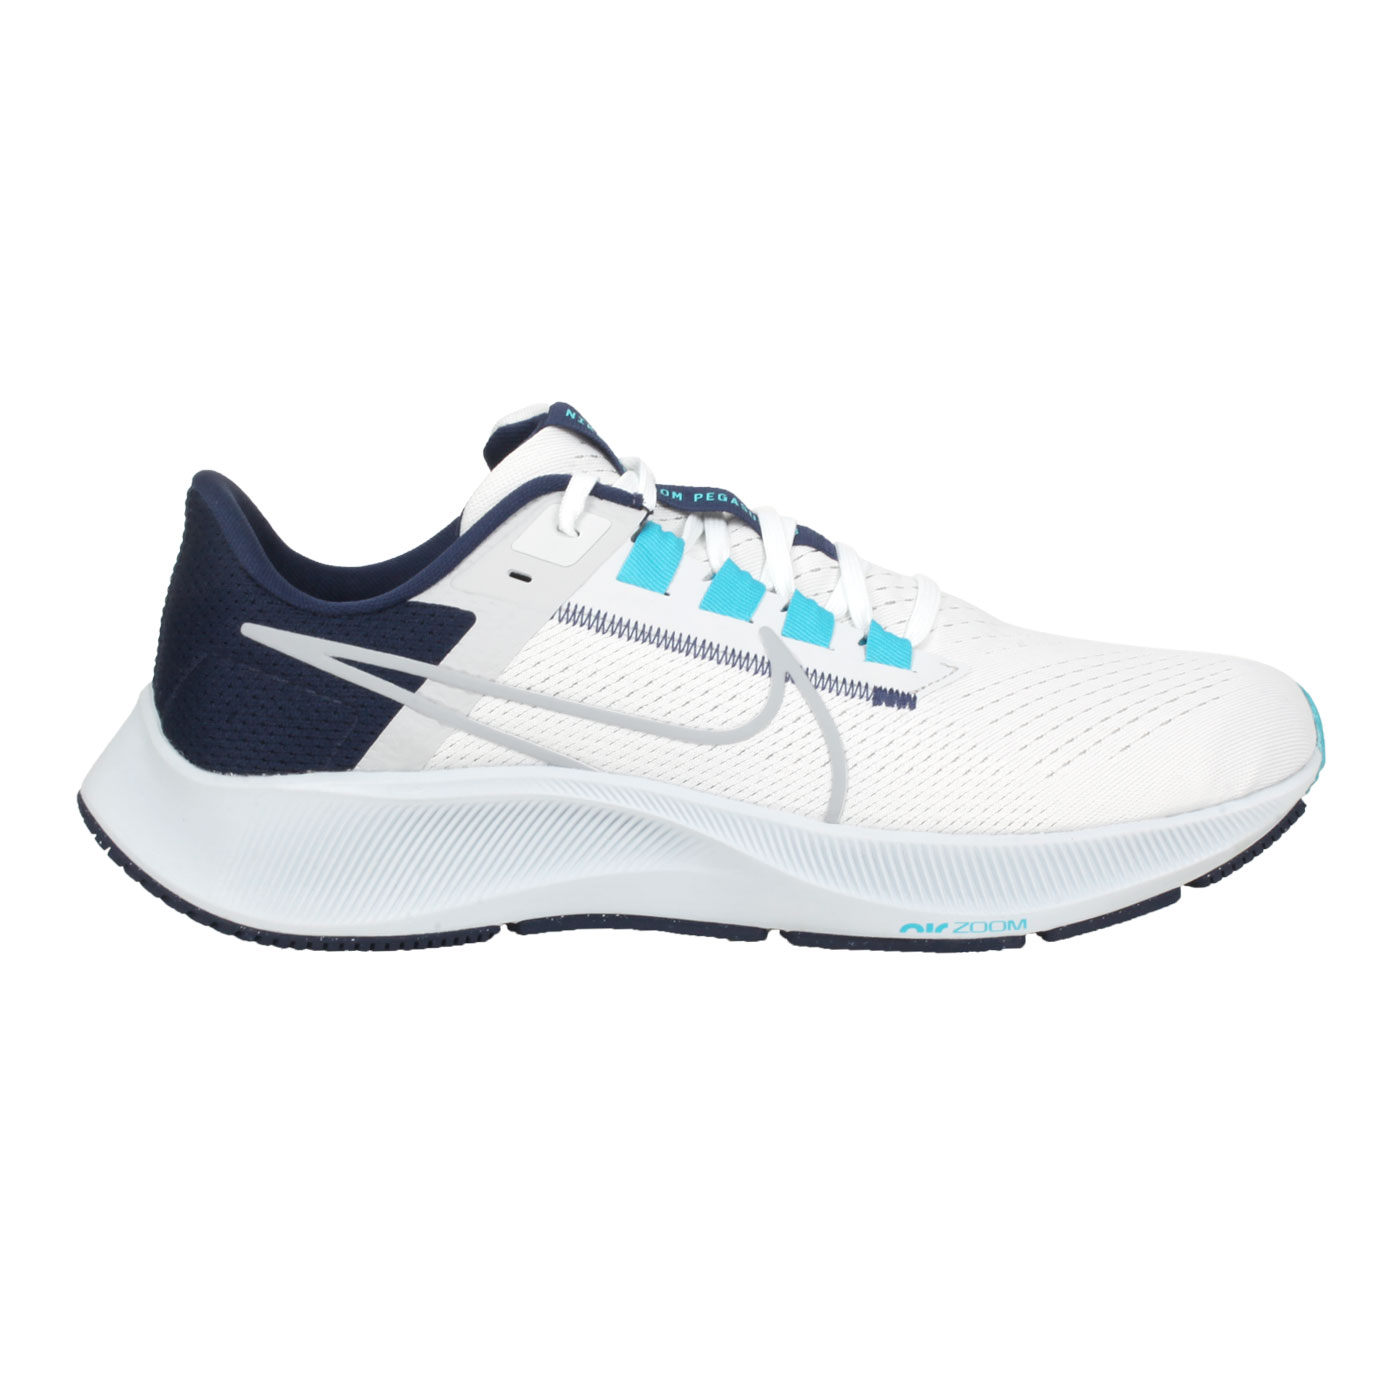 NIKE 男款運動慢跑鞋  @AIR ZOOM PEGASUS 38@CW7356101 - 白丈青藍